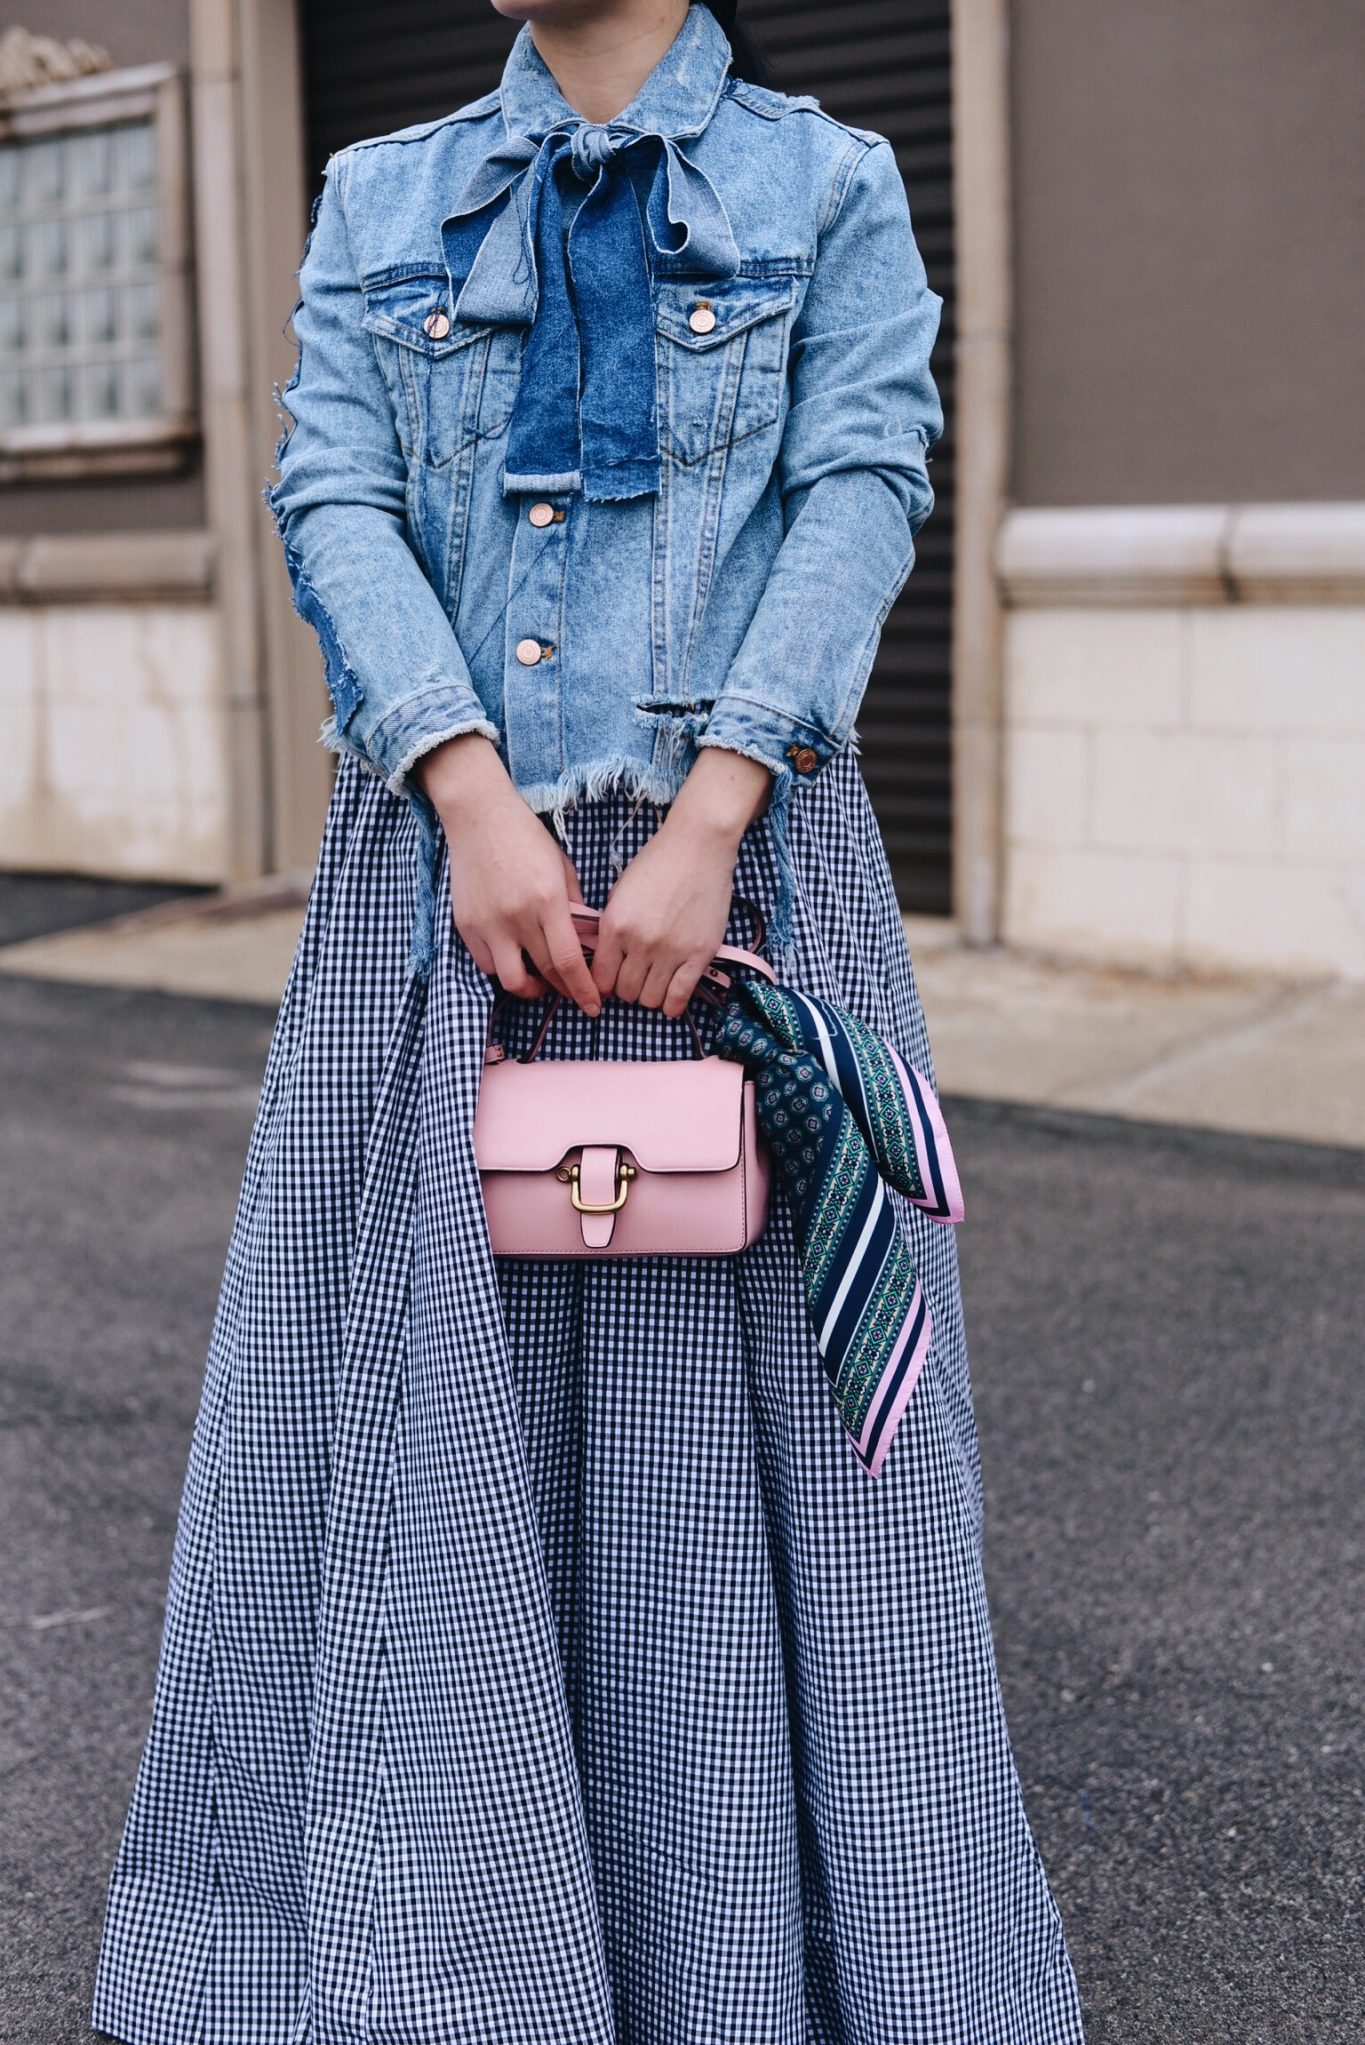 7e0abf0b9 HallieDaily, Style, Street Style, Outfit, Spring Style, Zara, Denim Jacket  with Bow, J.Crew Maxi Ball Skirt, Gingham, J.Crew Mini Pink Bag, ...